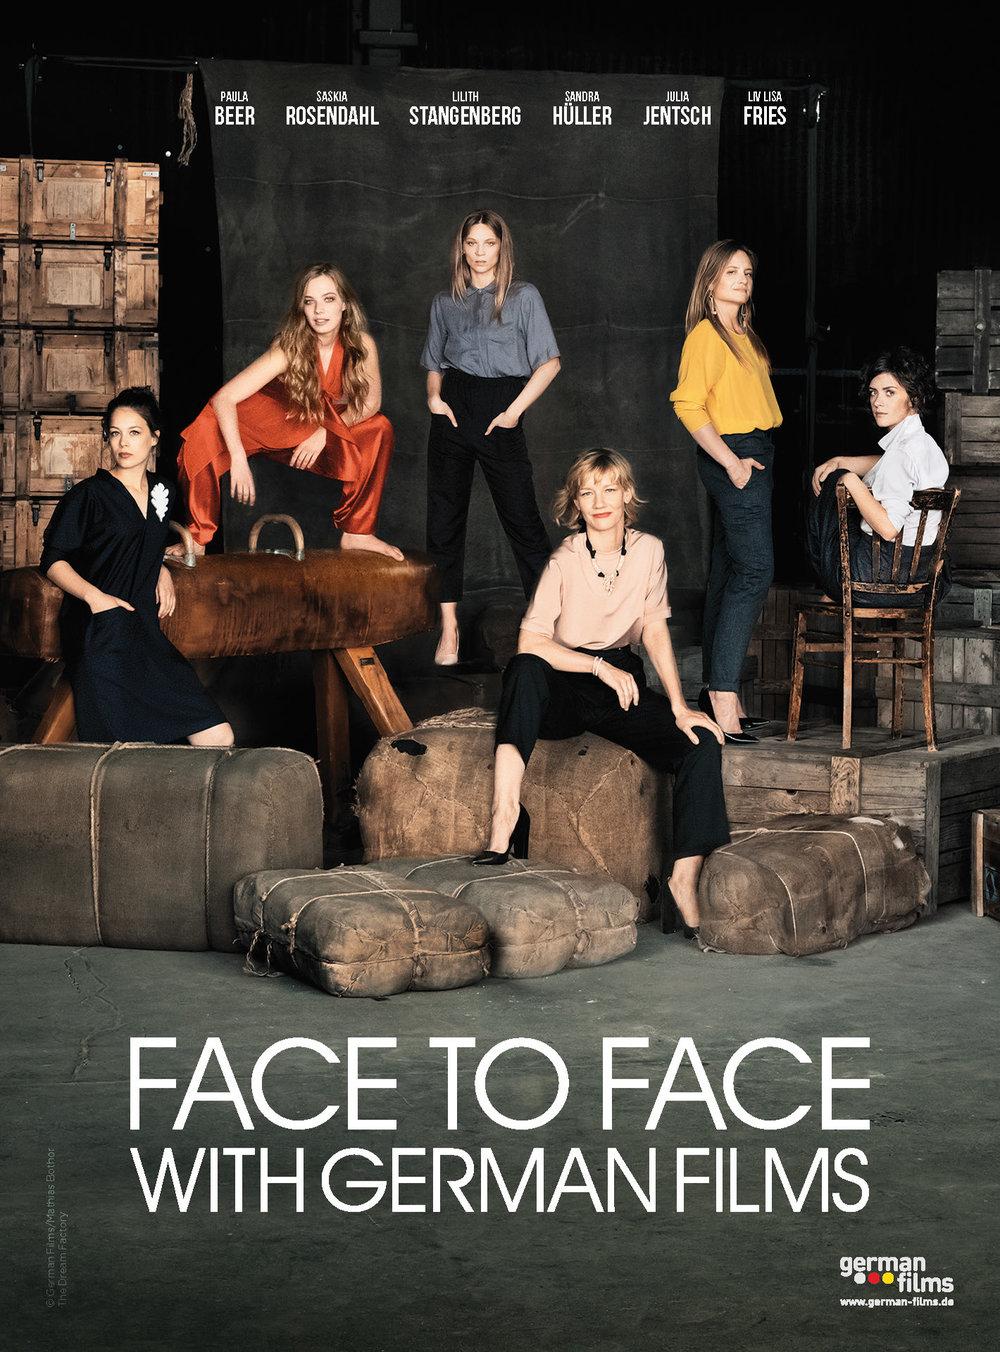 GermanFilms_FaceToFace_Advert_AFIFEST2016_4,25x5,75.jpg